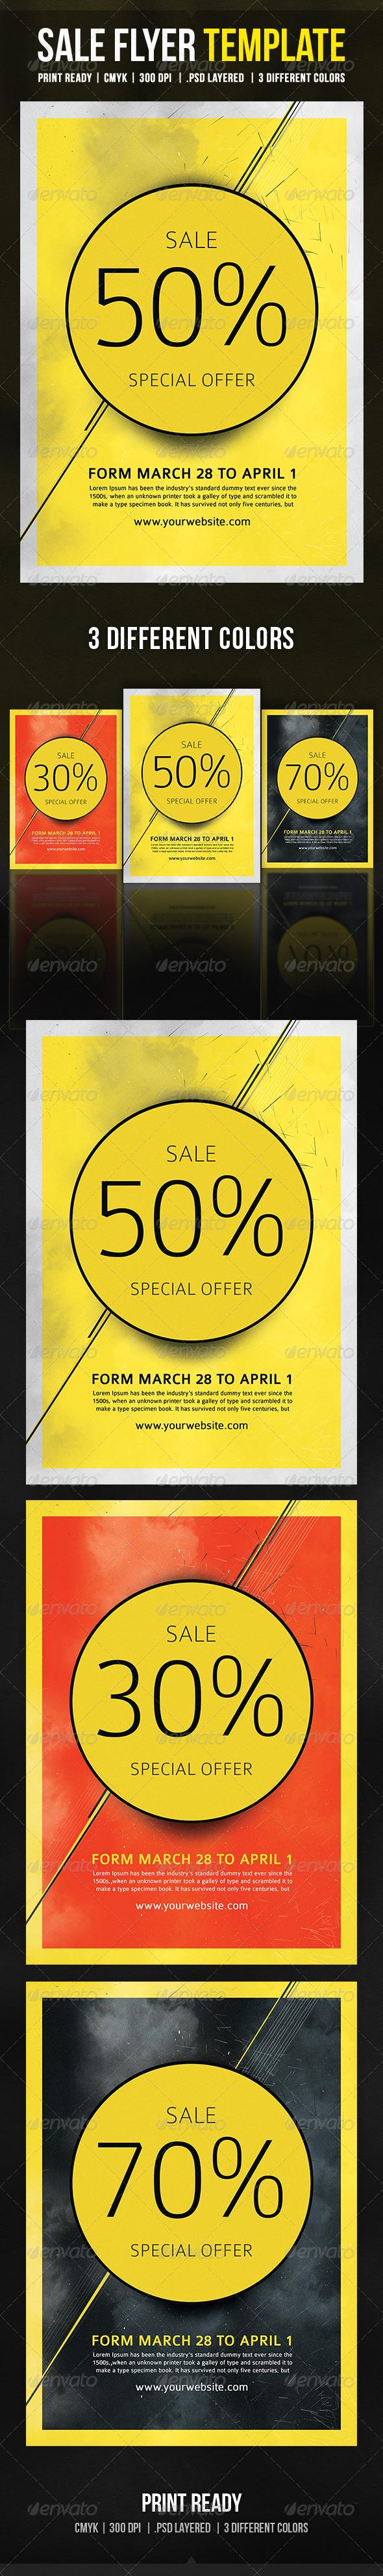 Sale Flyer Template - Commerce Flyers